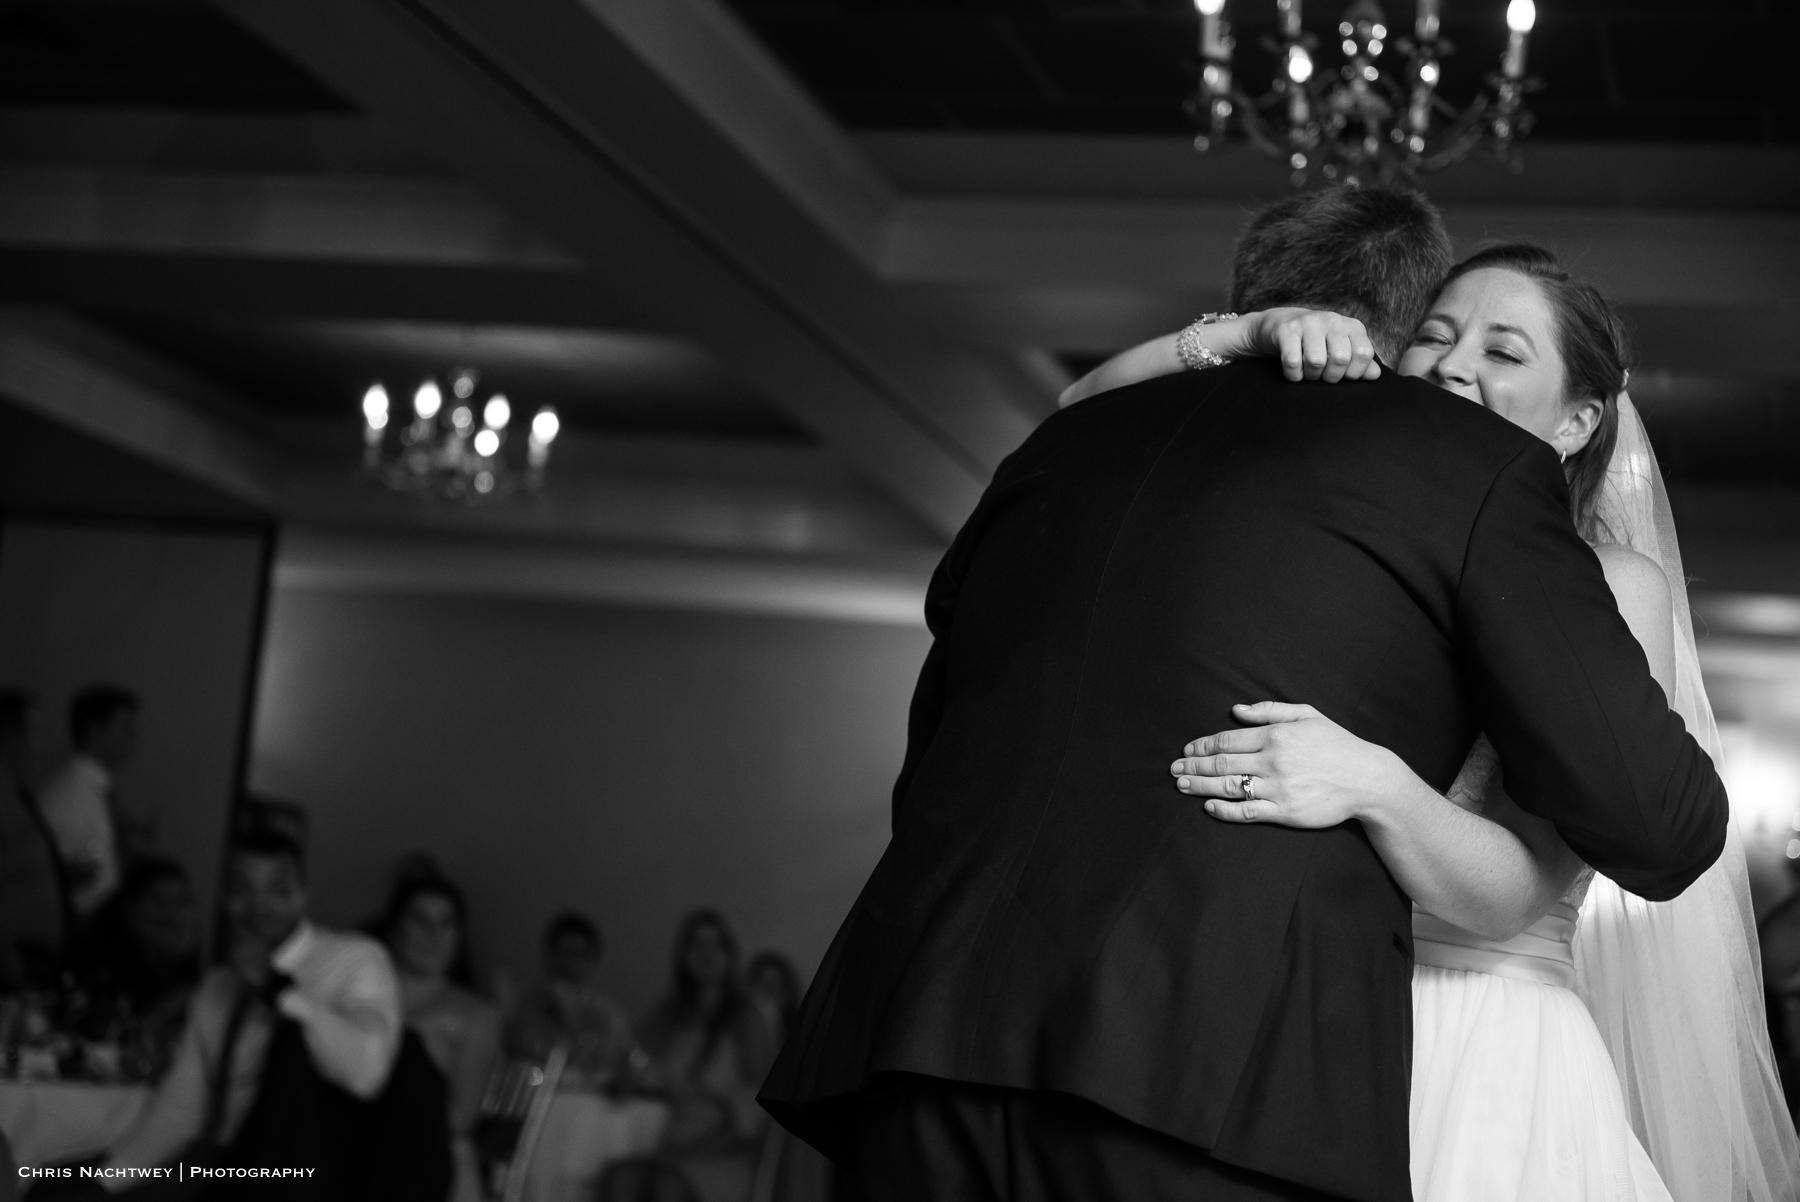 wedding-the-litchfield-inn-ct-photos-chris-nachtwey-photography-2018-57.jpg